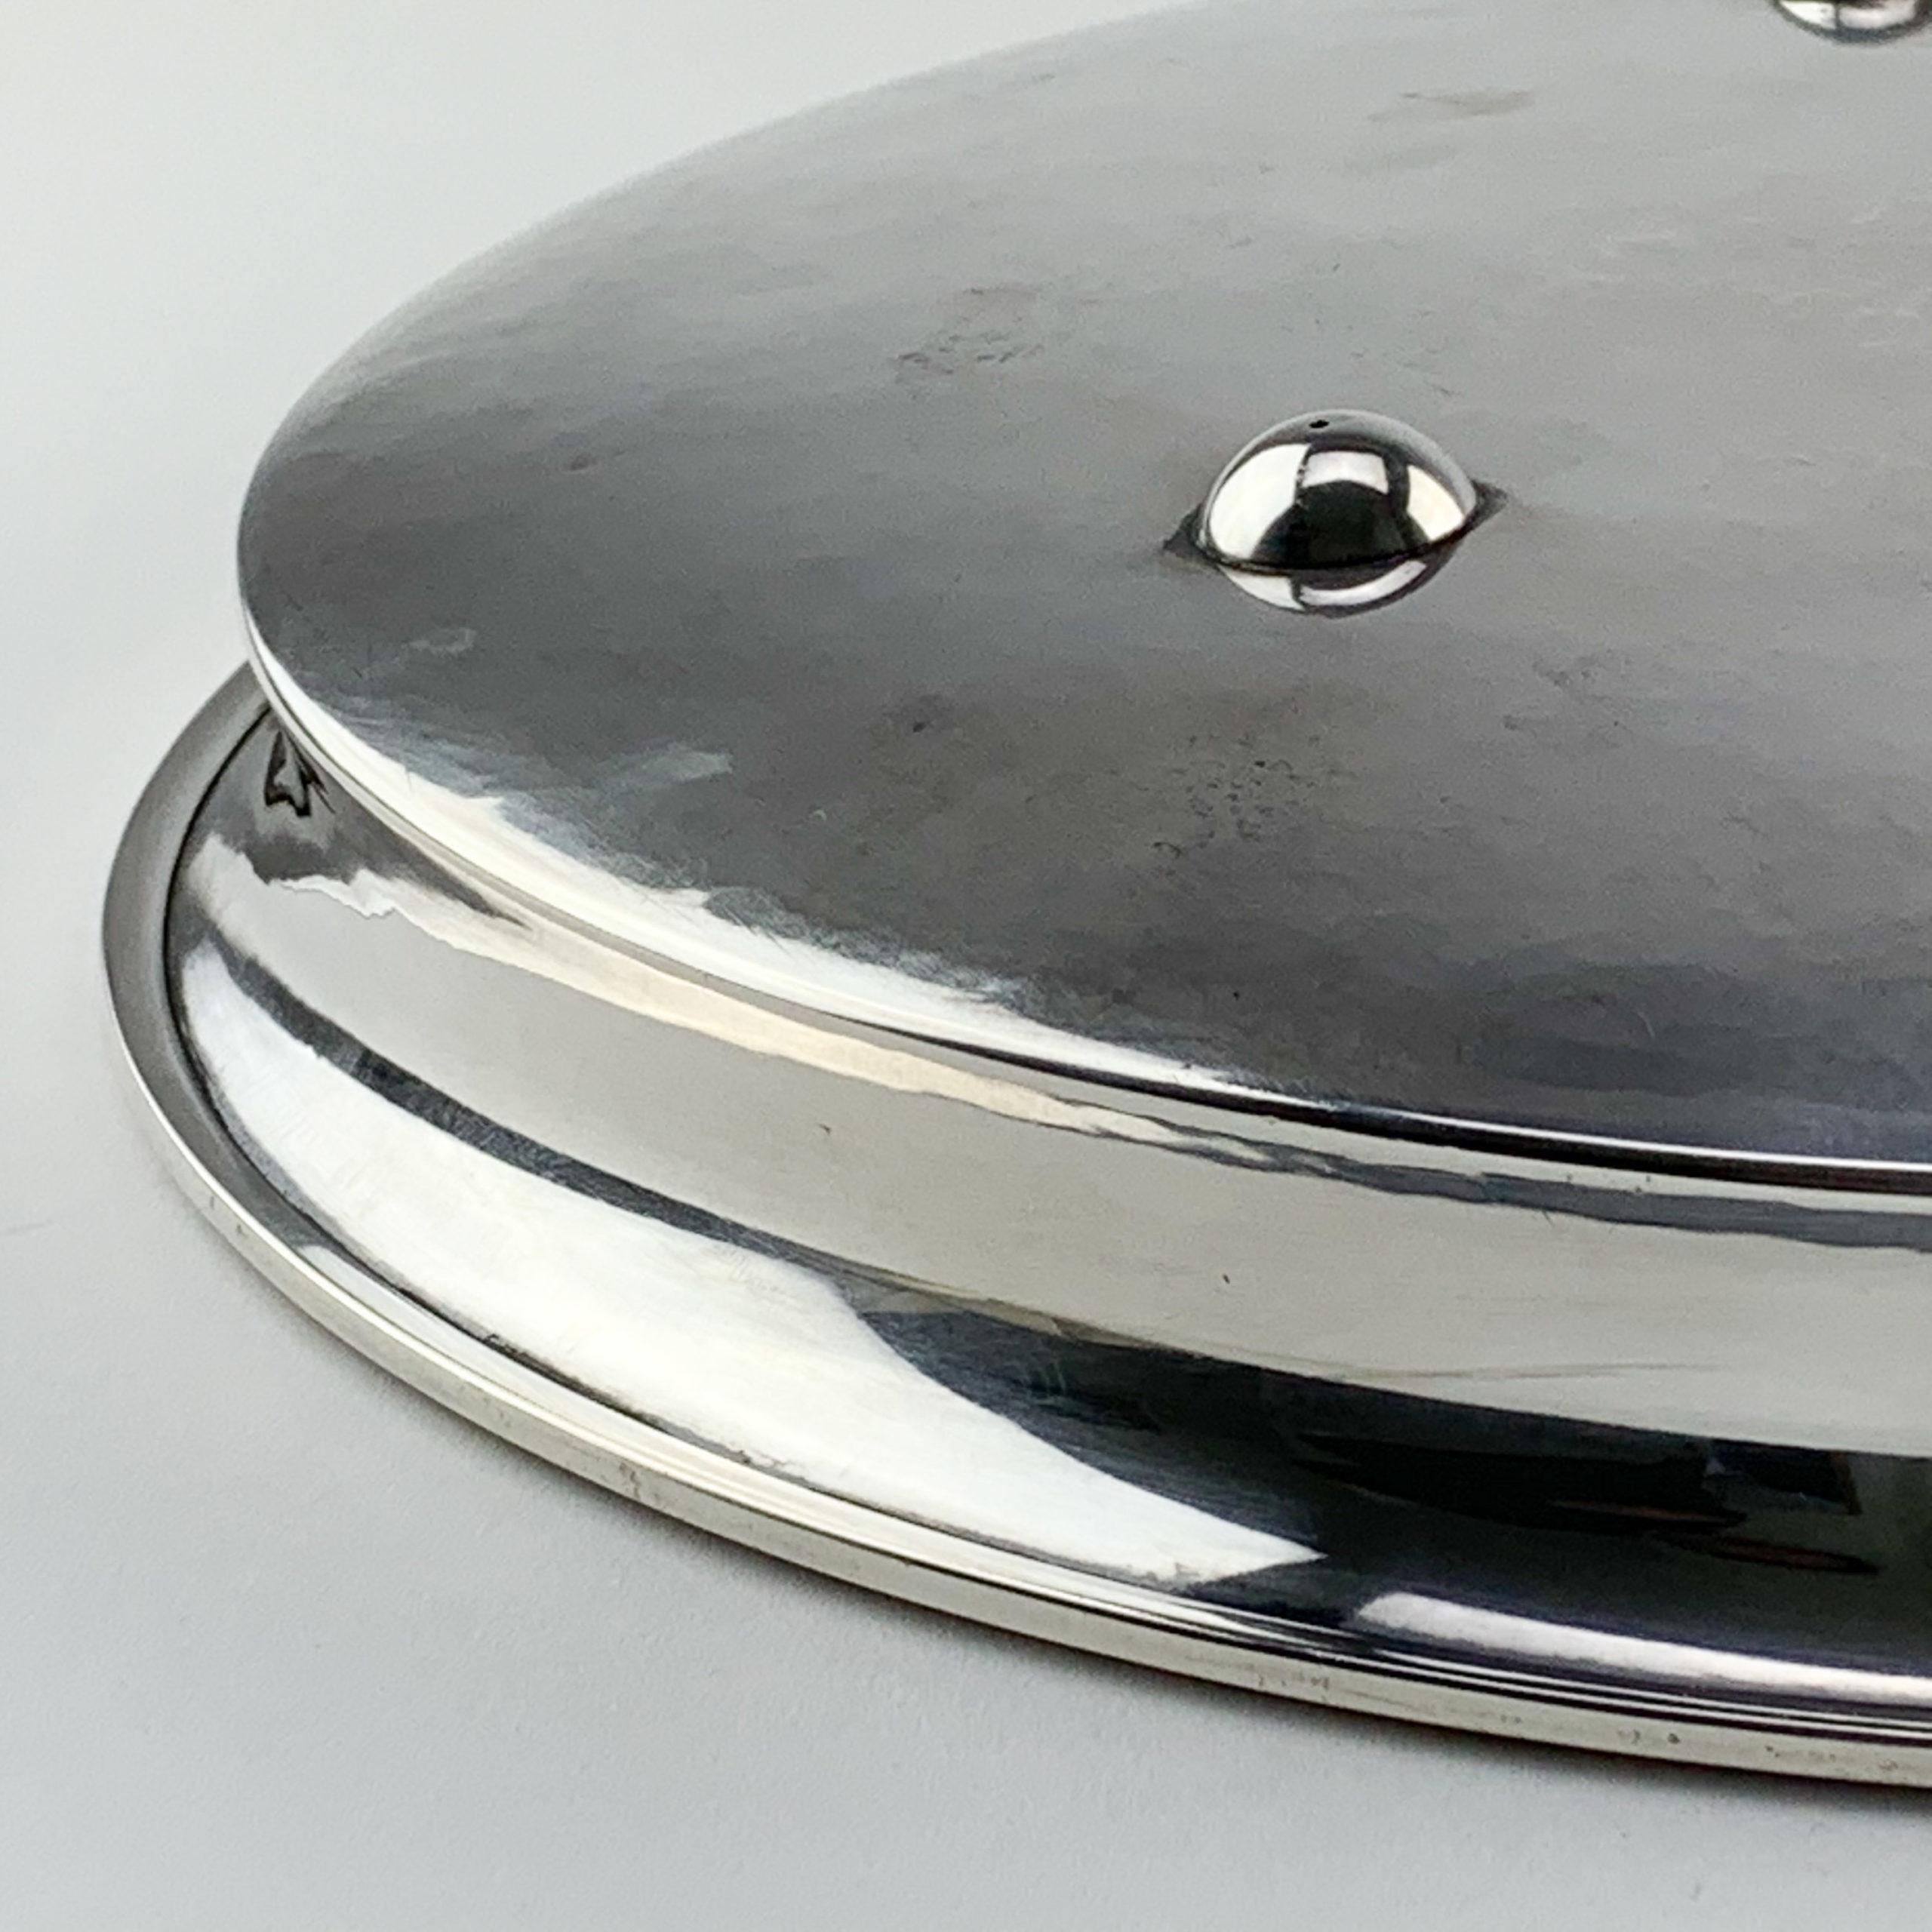 TW silver dish web-1484